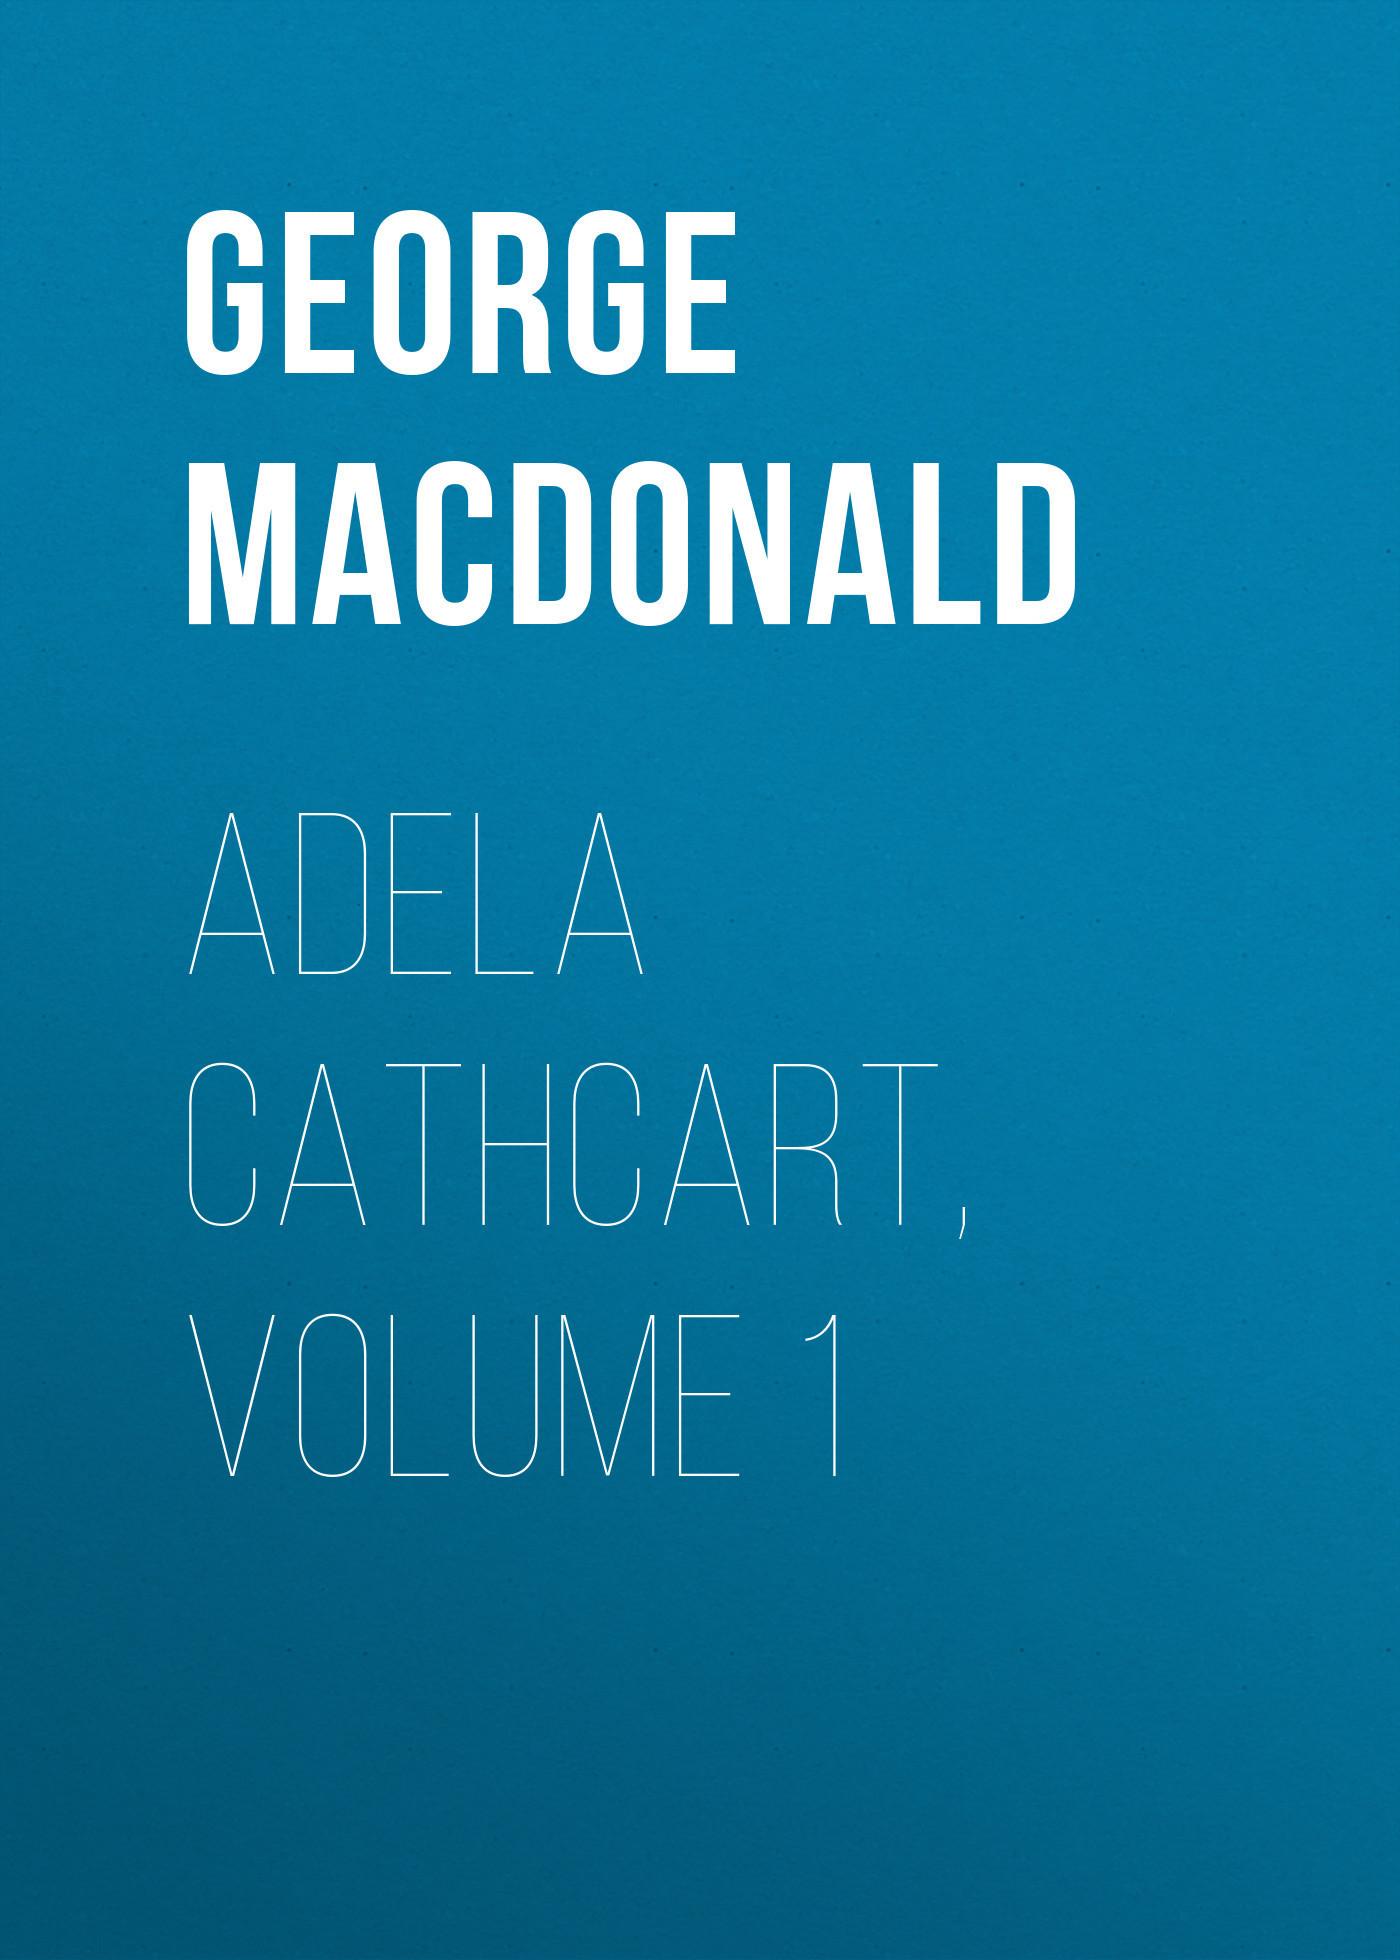 George MacDonald Adela Cathcart, Volume 1 bumf volume 1